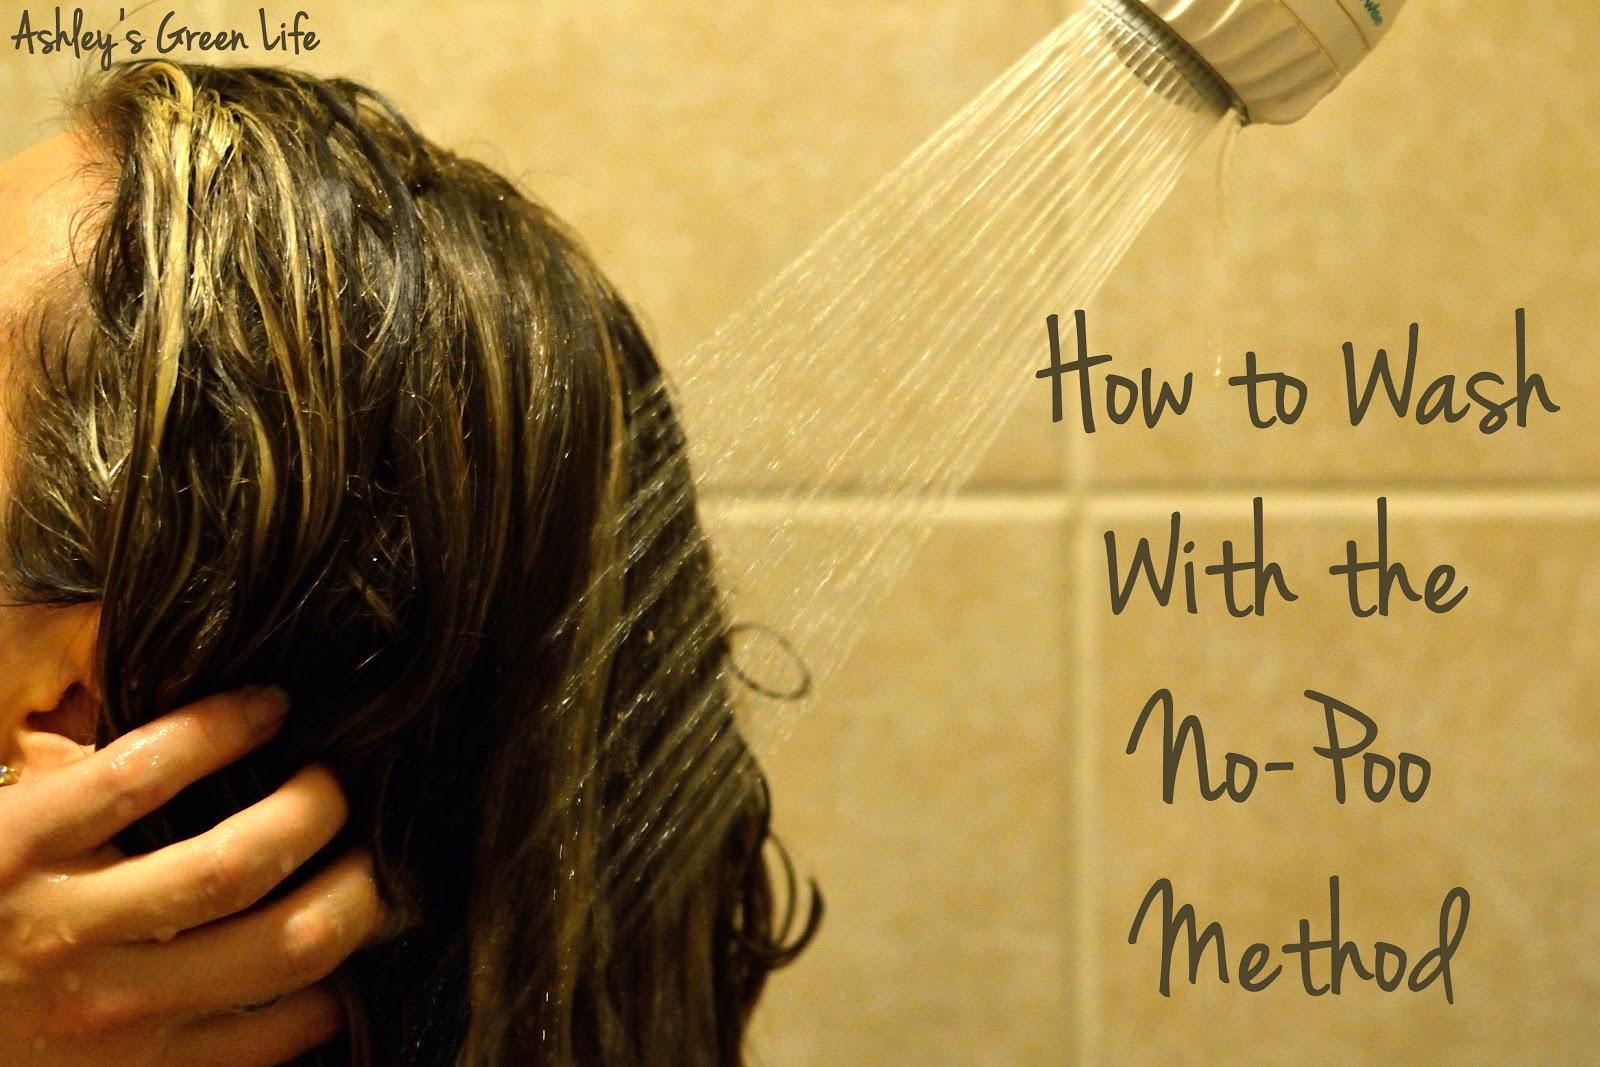 No Poo Methode